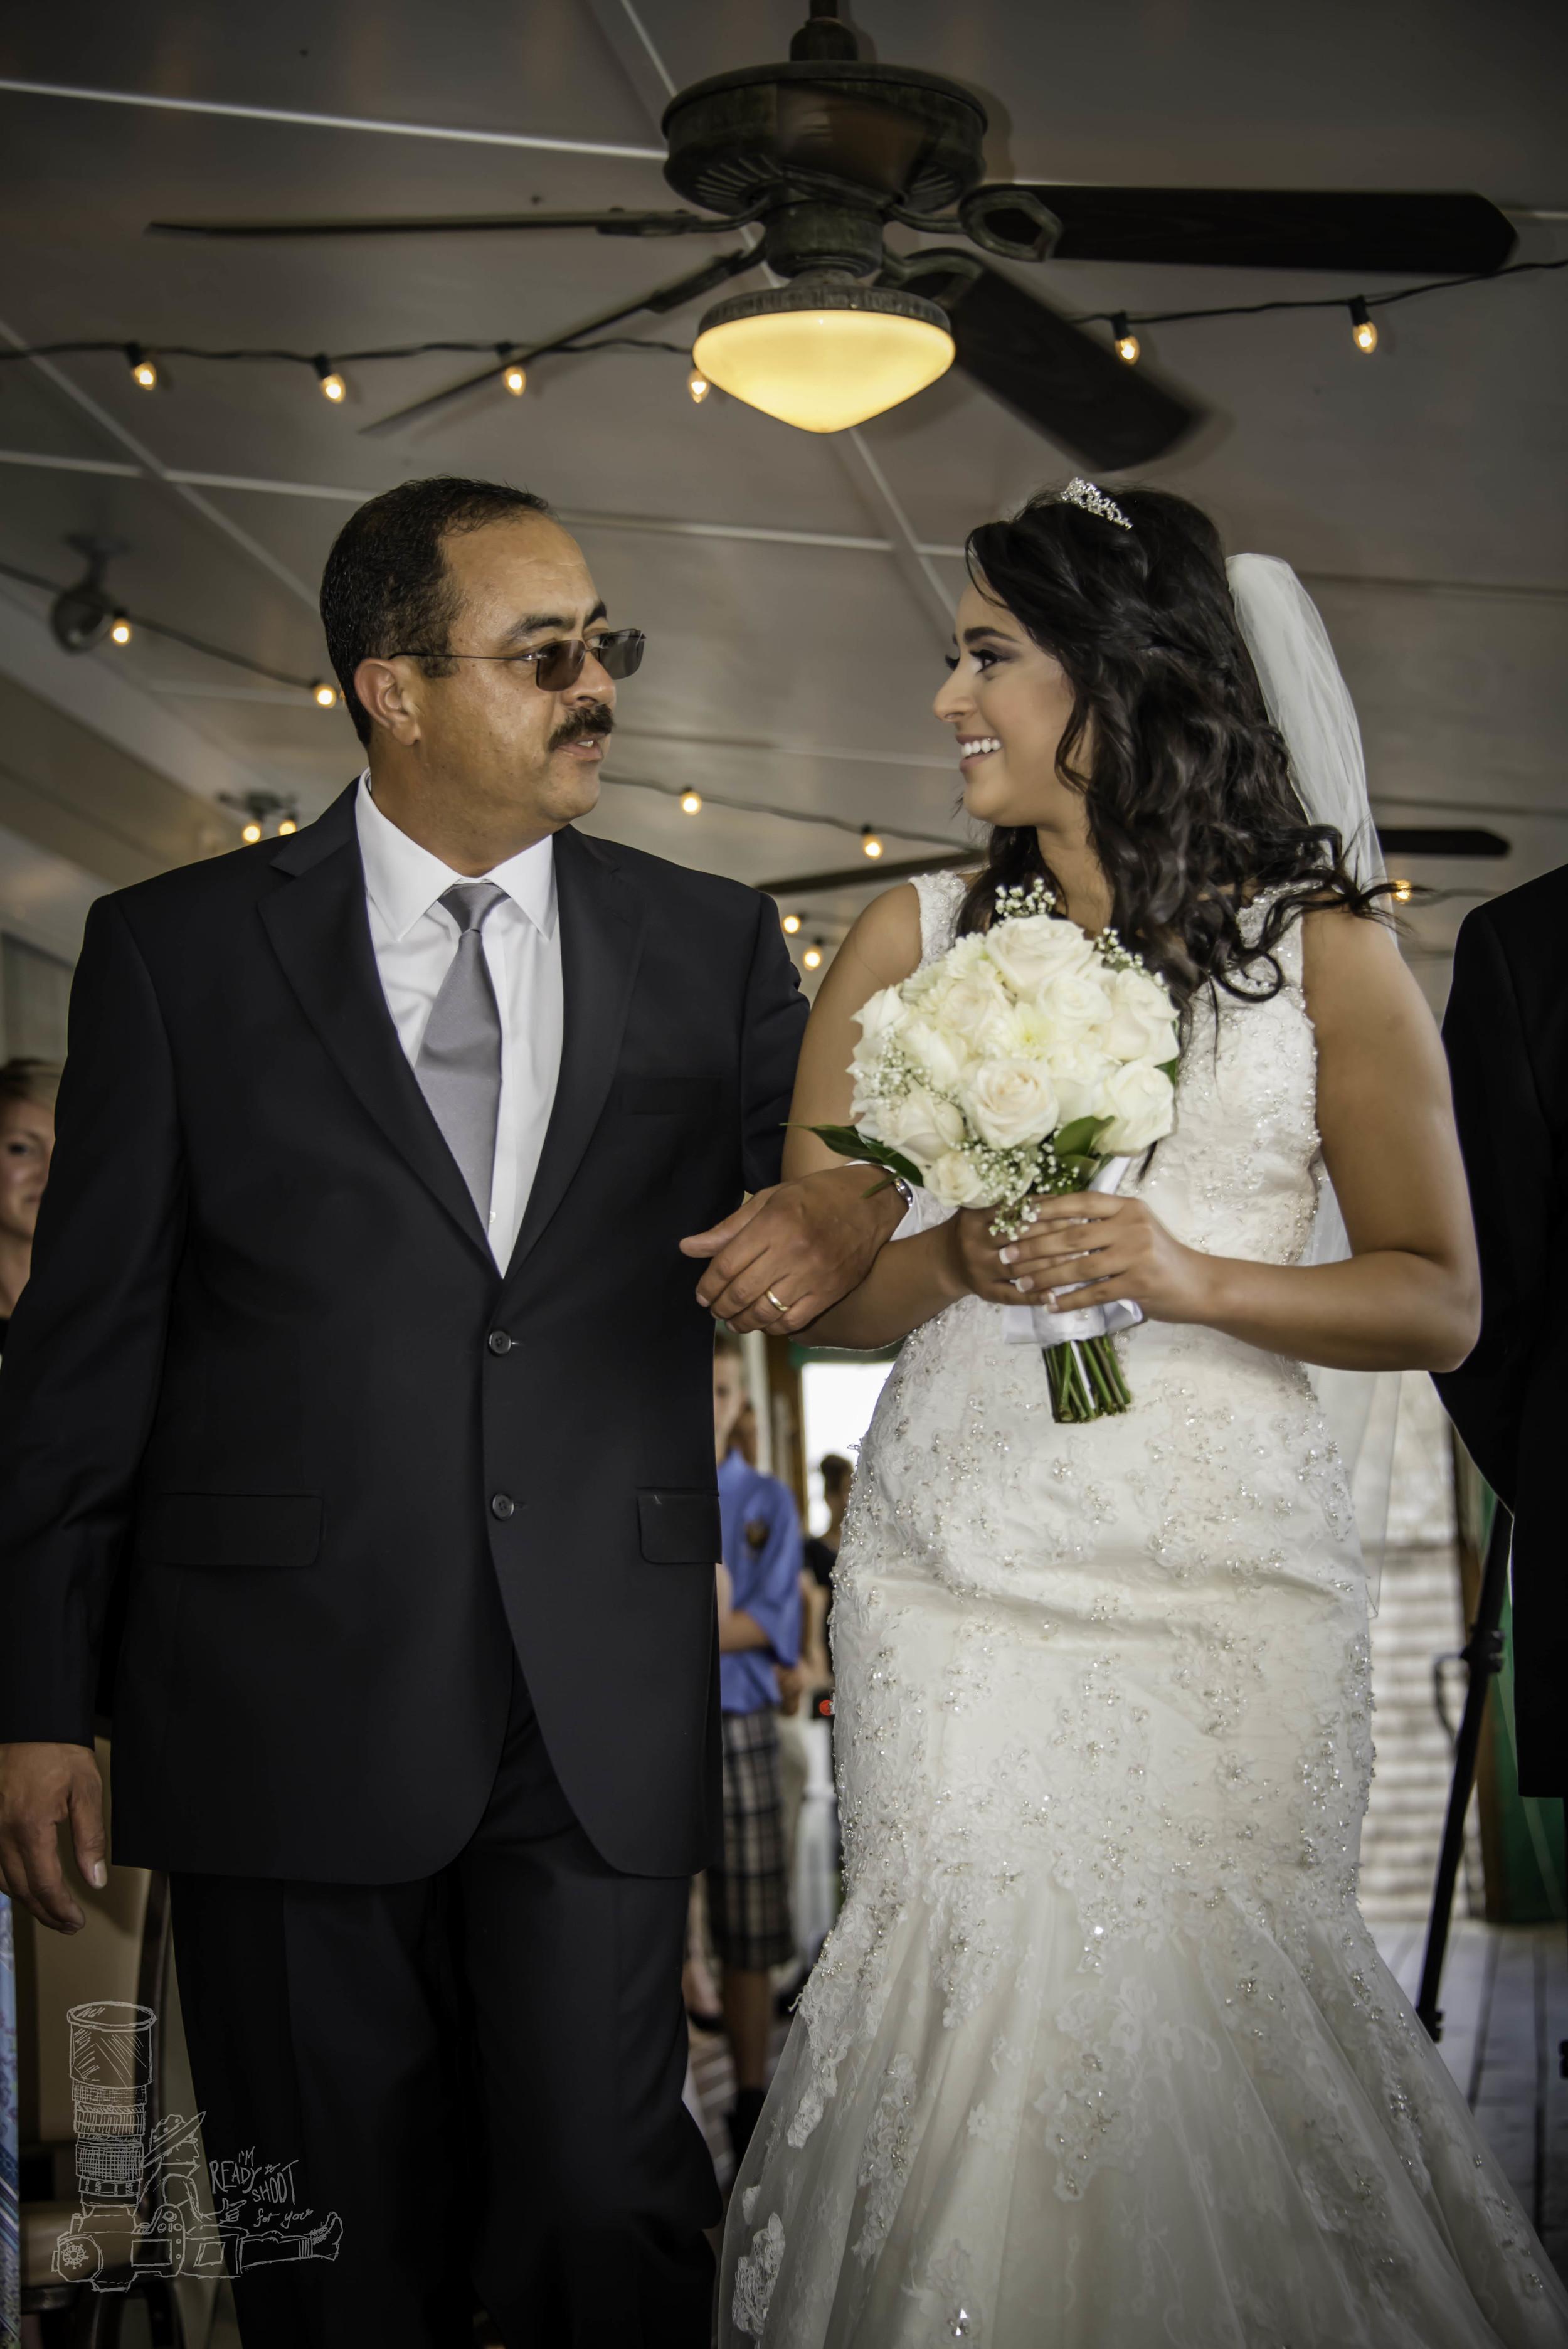 Shai & Chris Wedding Day-161.jpg